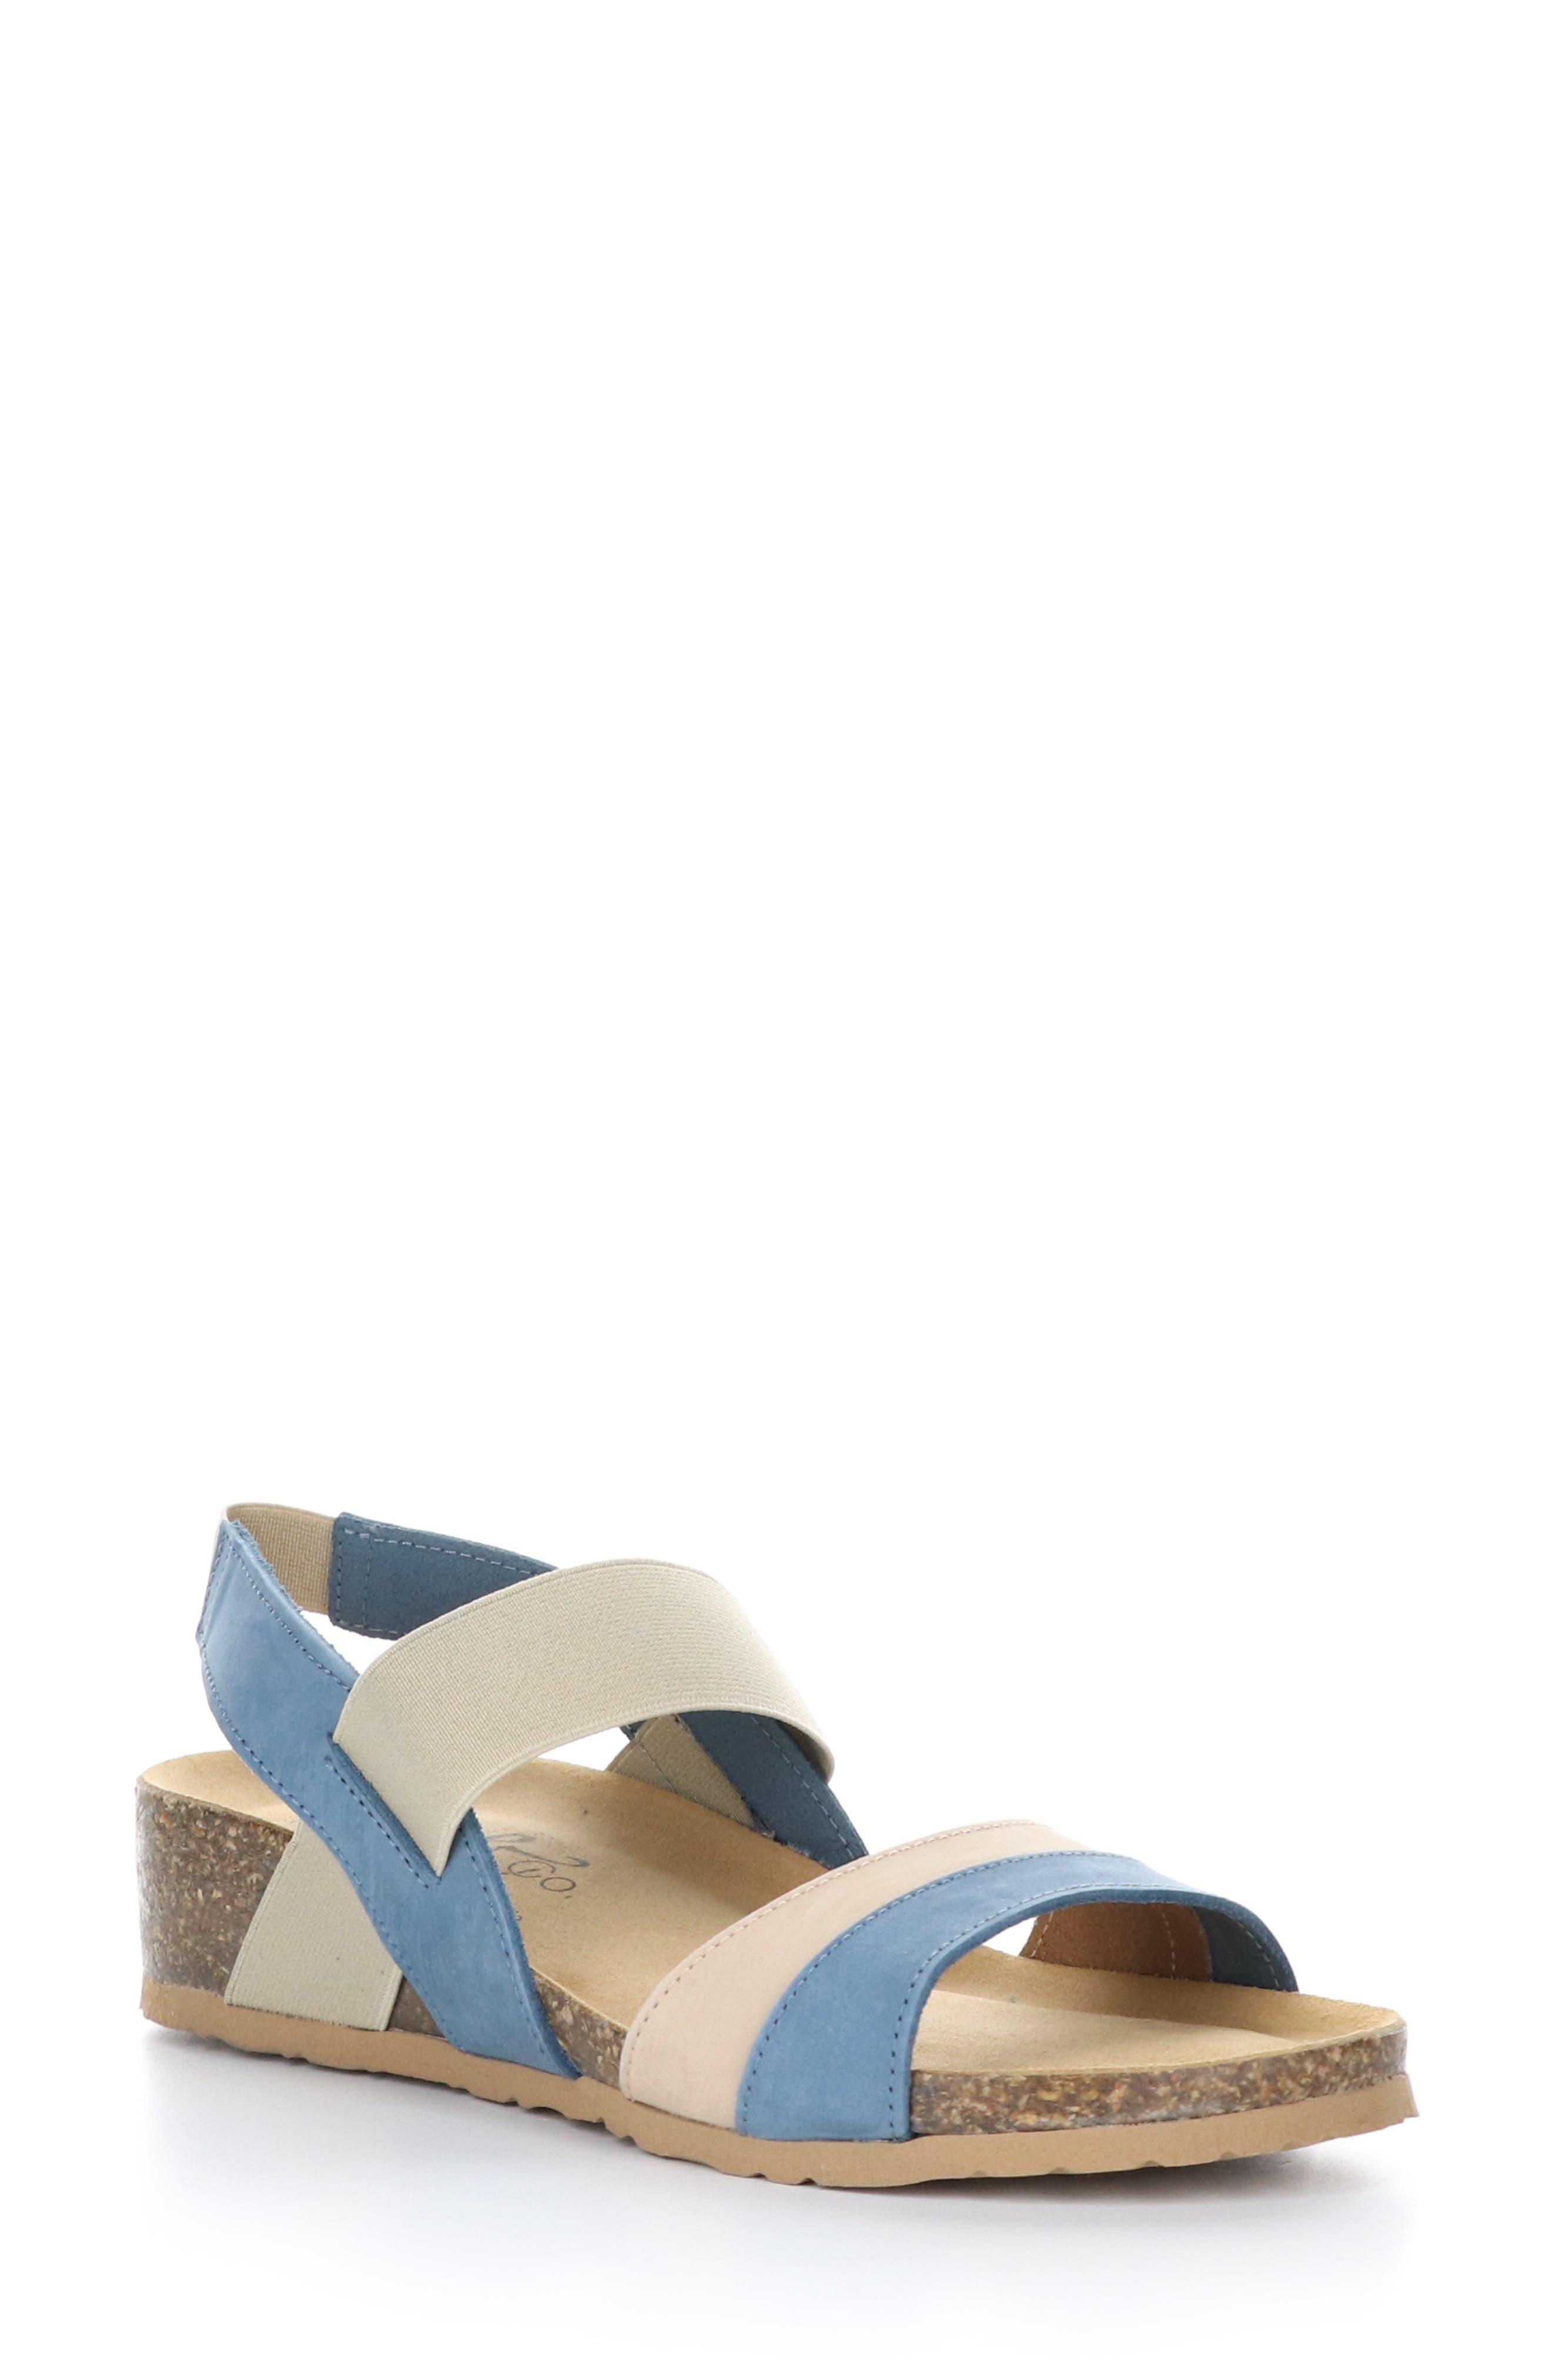 Labos Wedge Sandal